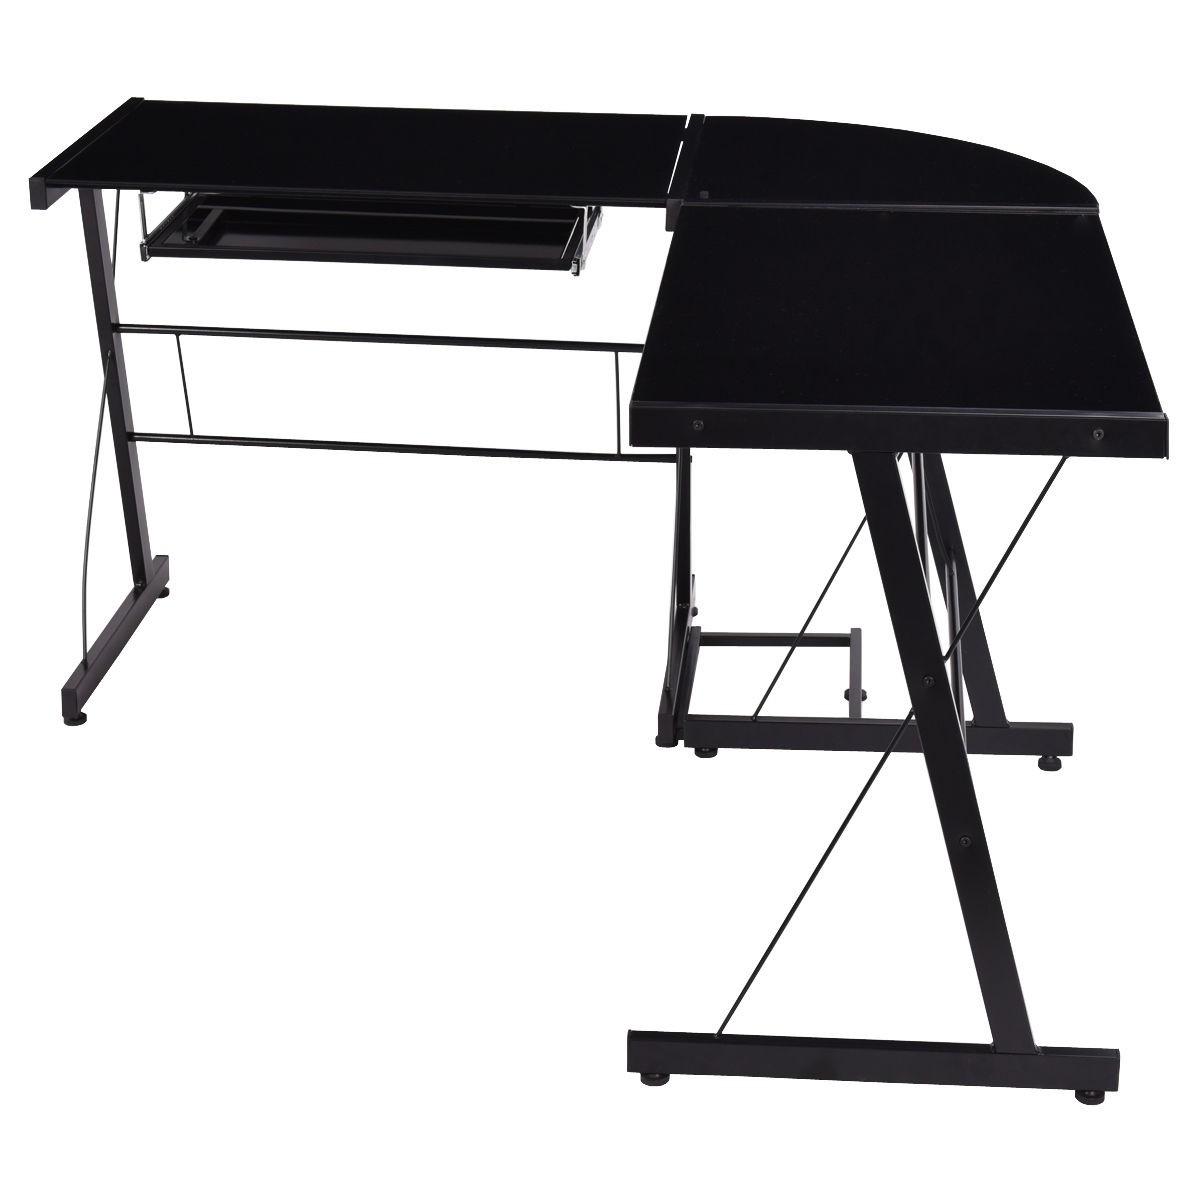 L Shaped Corner Desk Computer Workstation Home Office: L-Shape Computer Desk PC Laptop Table Glass Top